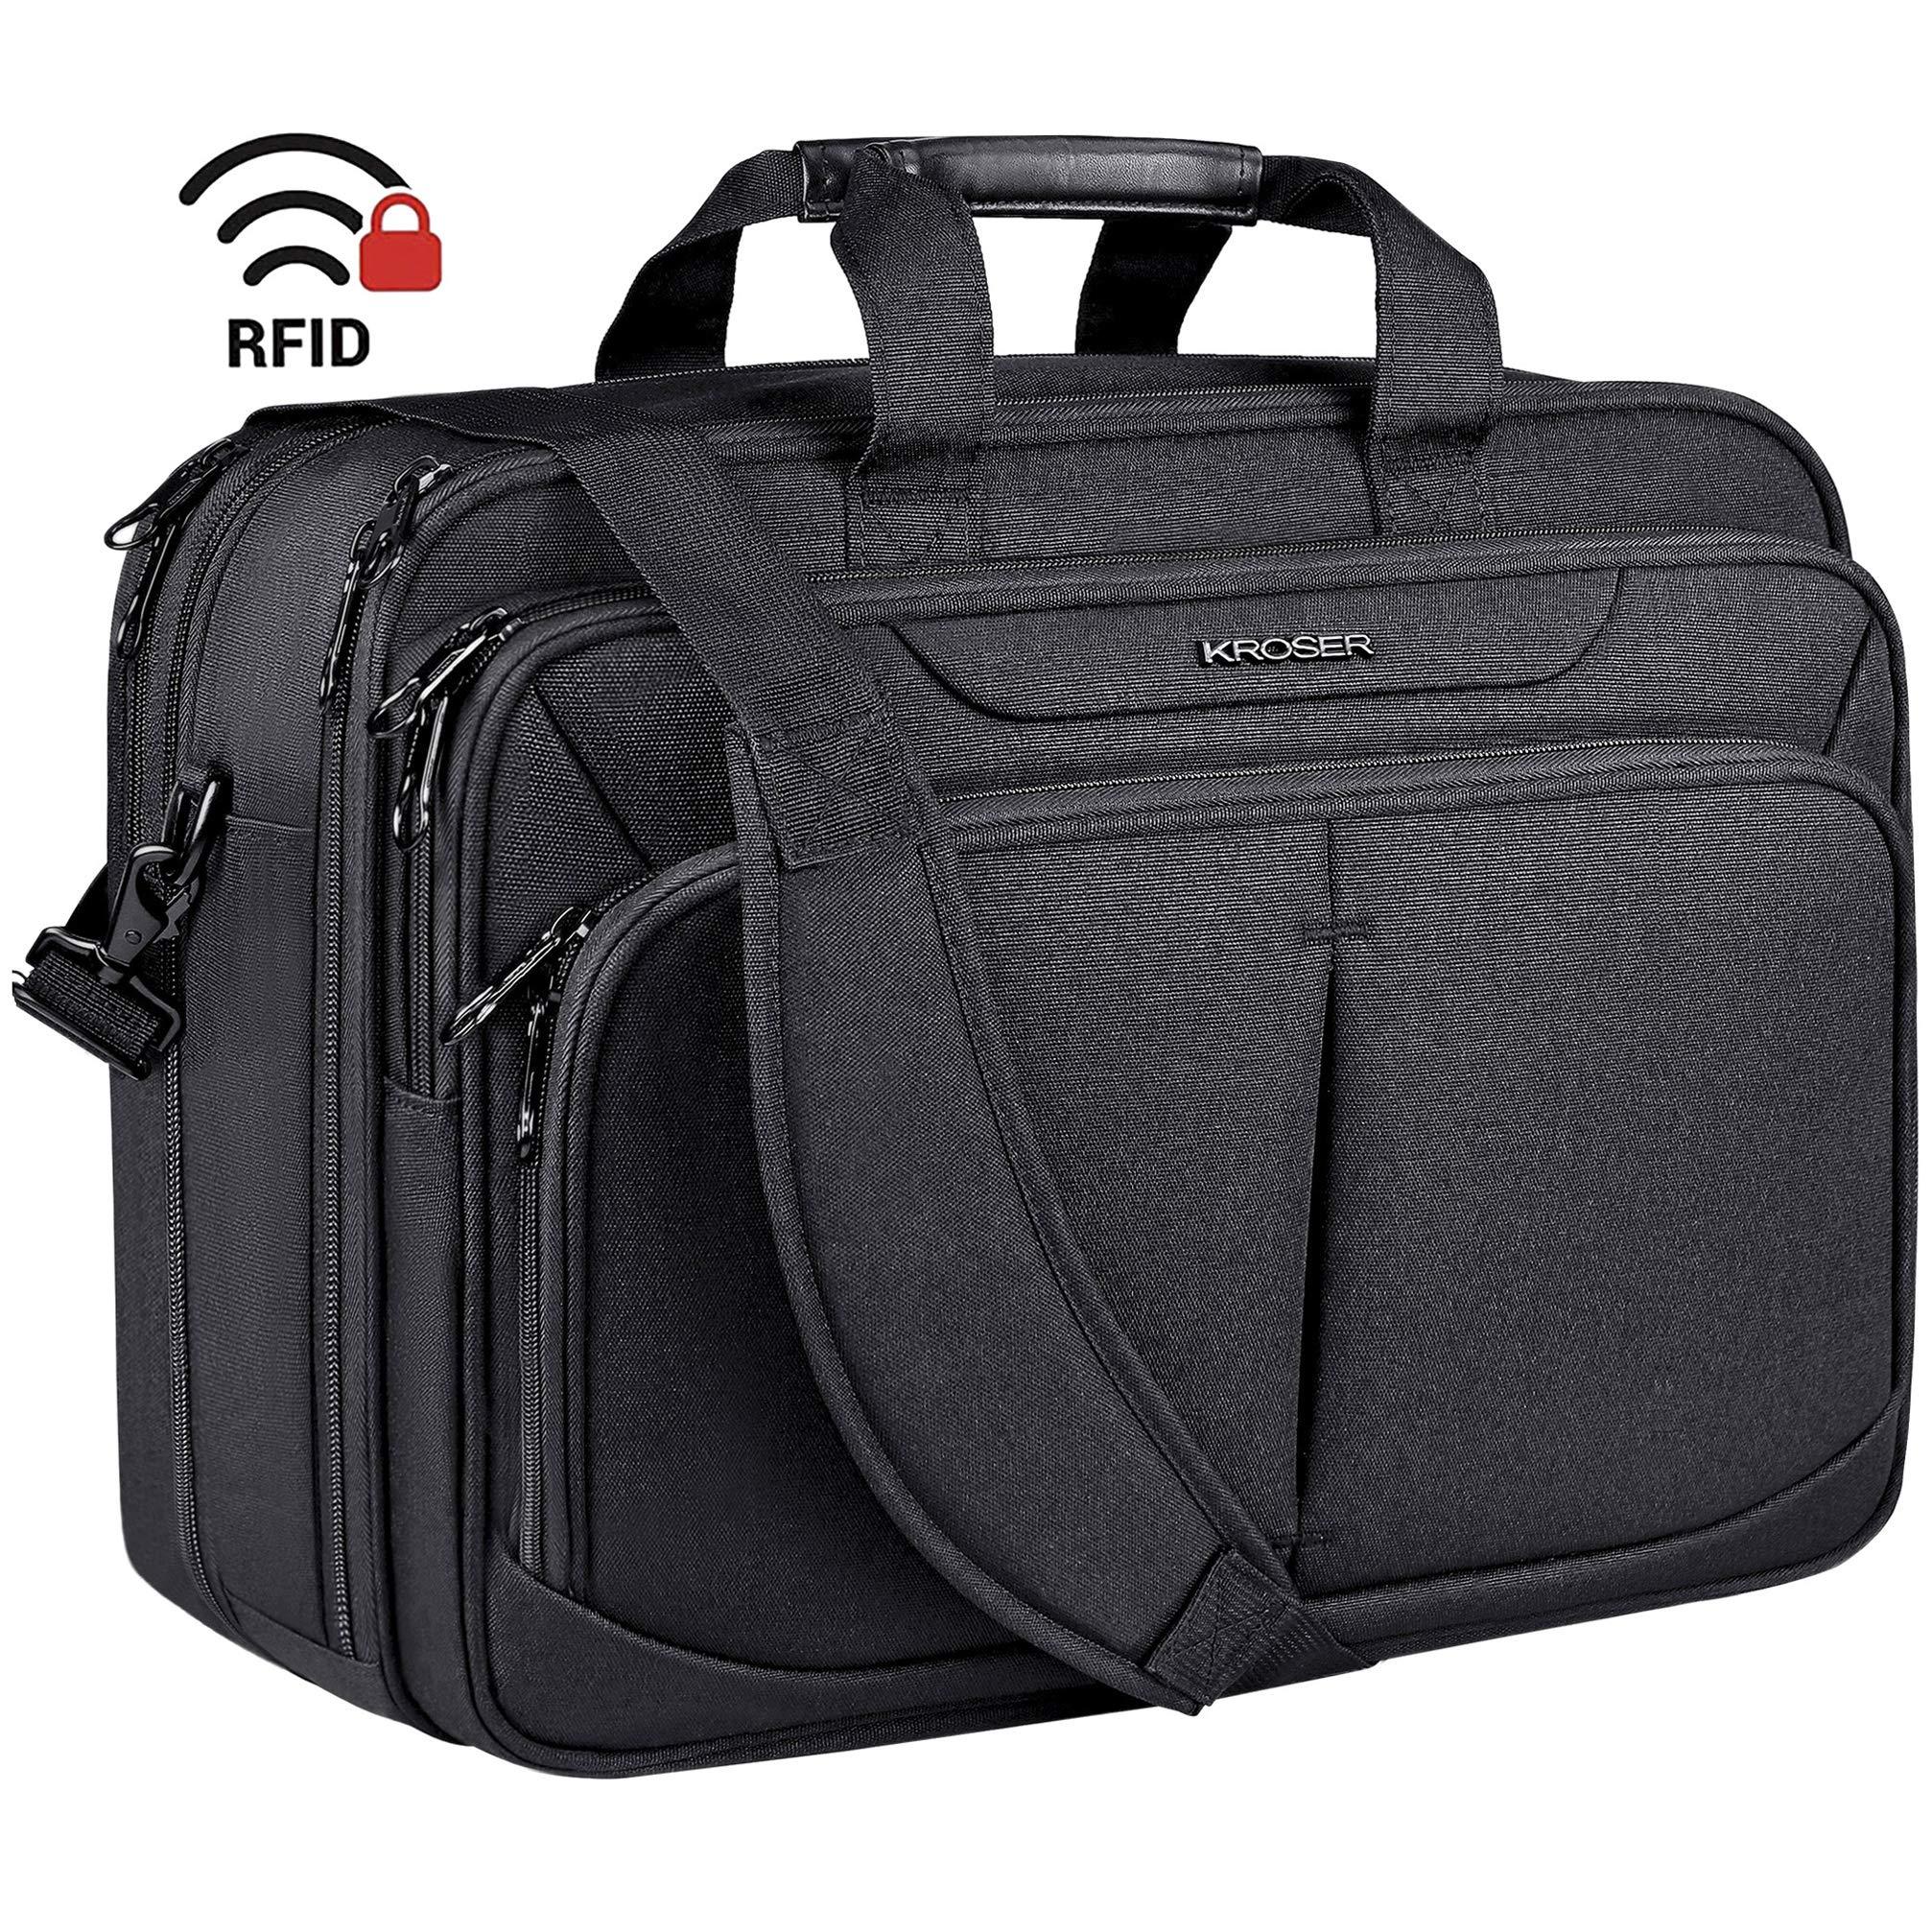 KROSER Laptop Bag 17.1'' Upgraded Expandable Lightweight Briefcase for 15.6''-17'' Laptop Premium Business Work Bag Water-Repellent Messenger Bag with RFID Pockets for School/Travel/Women/Men-Black by KROSER